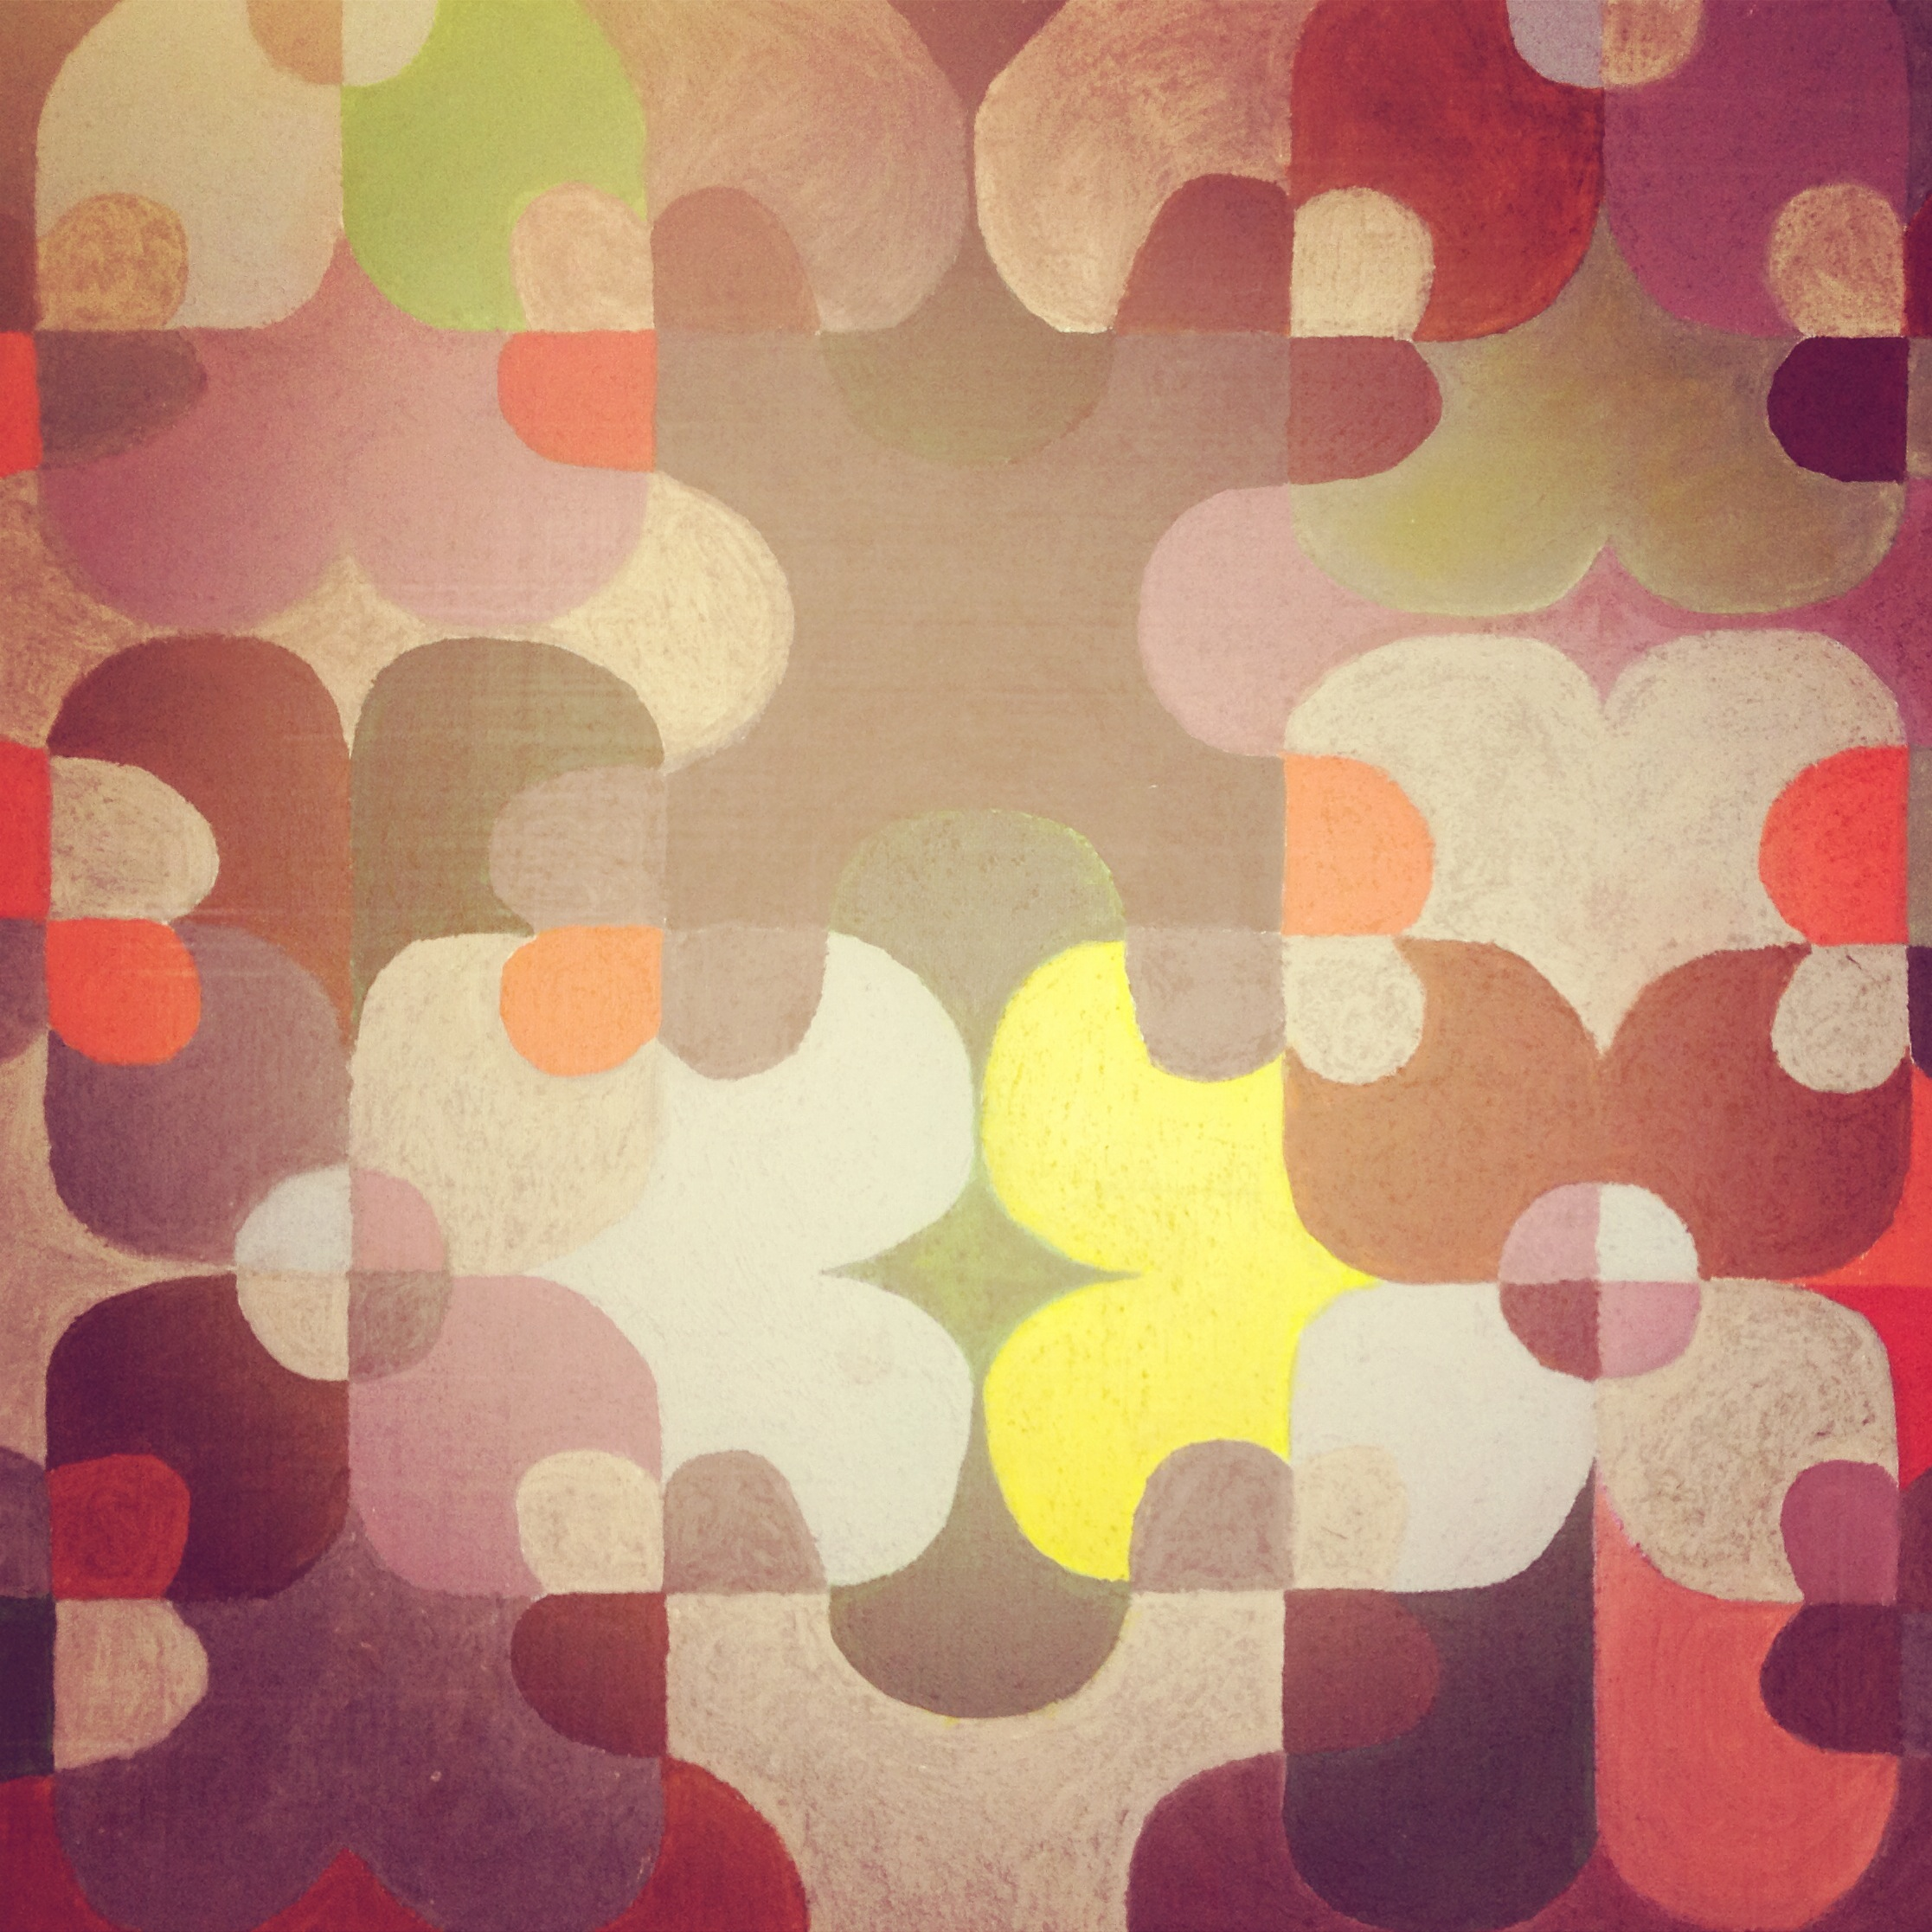 Frieze, Acrylic on canvas